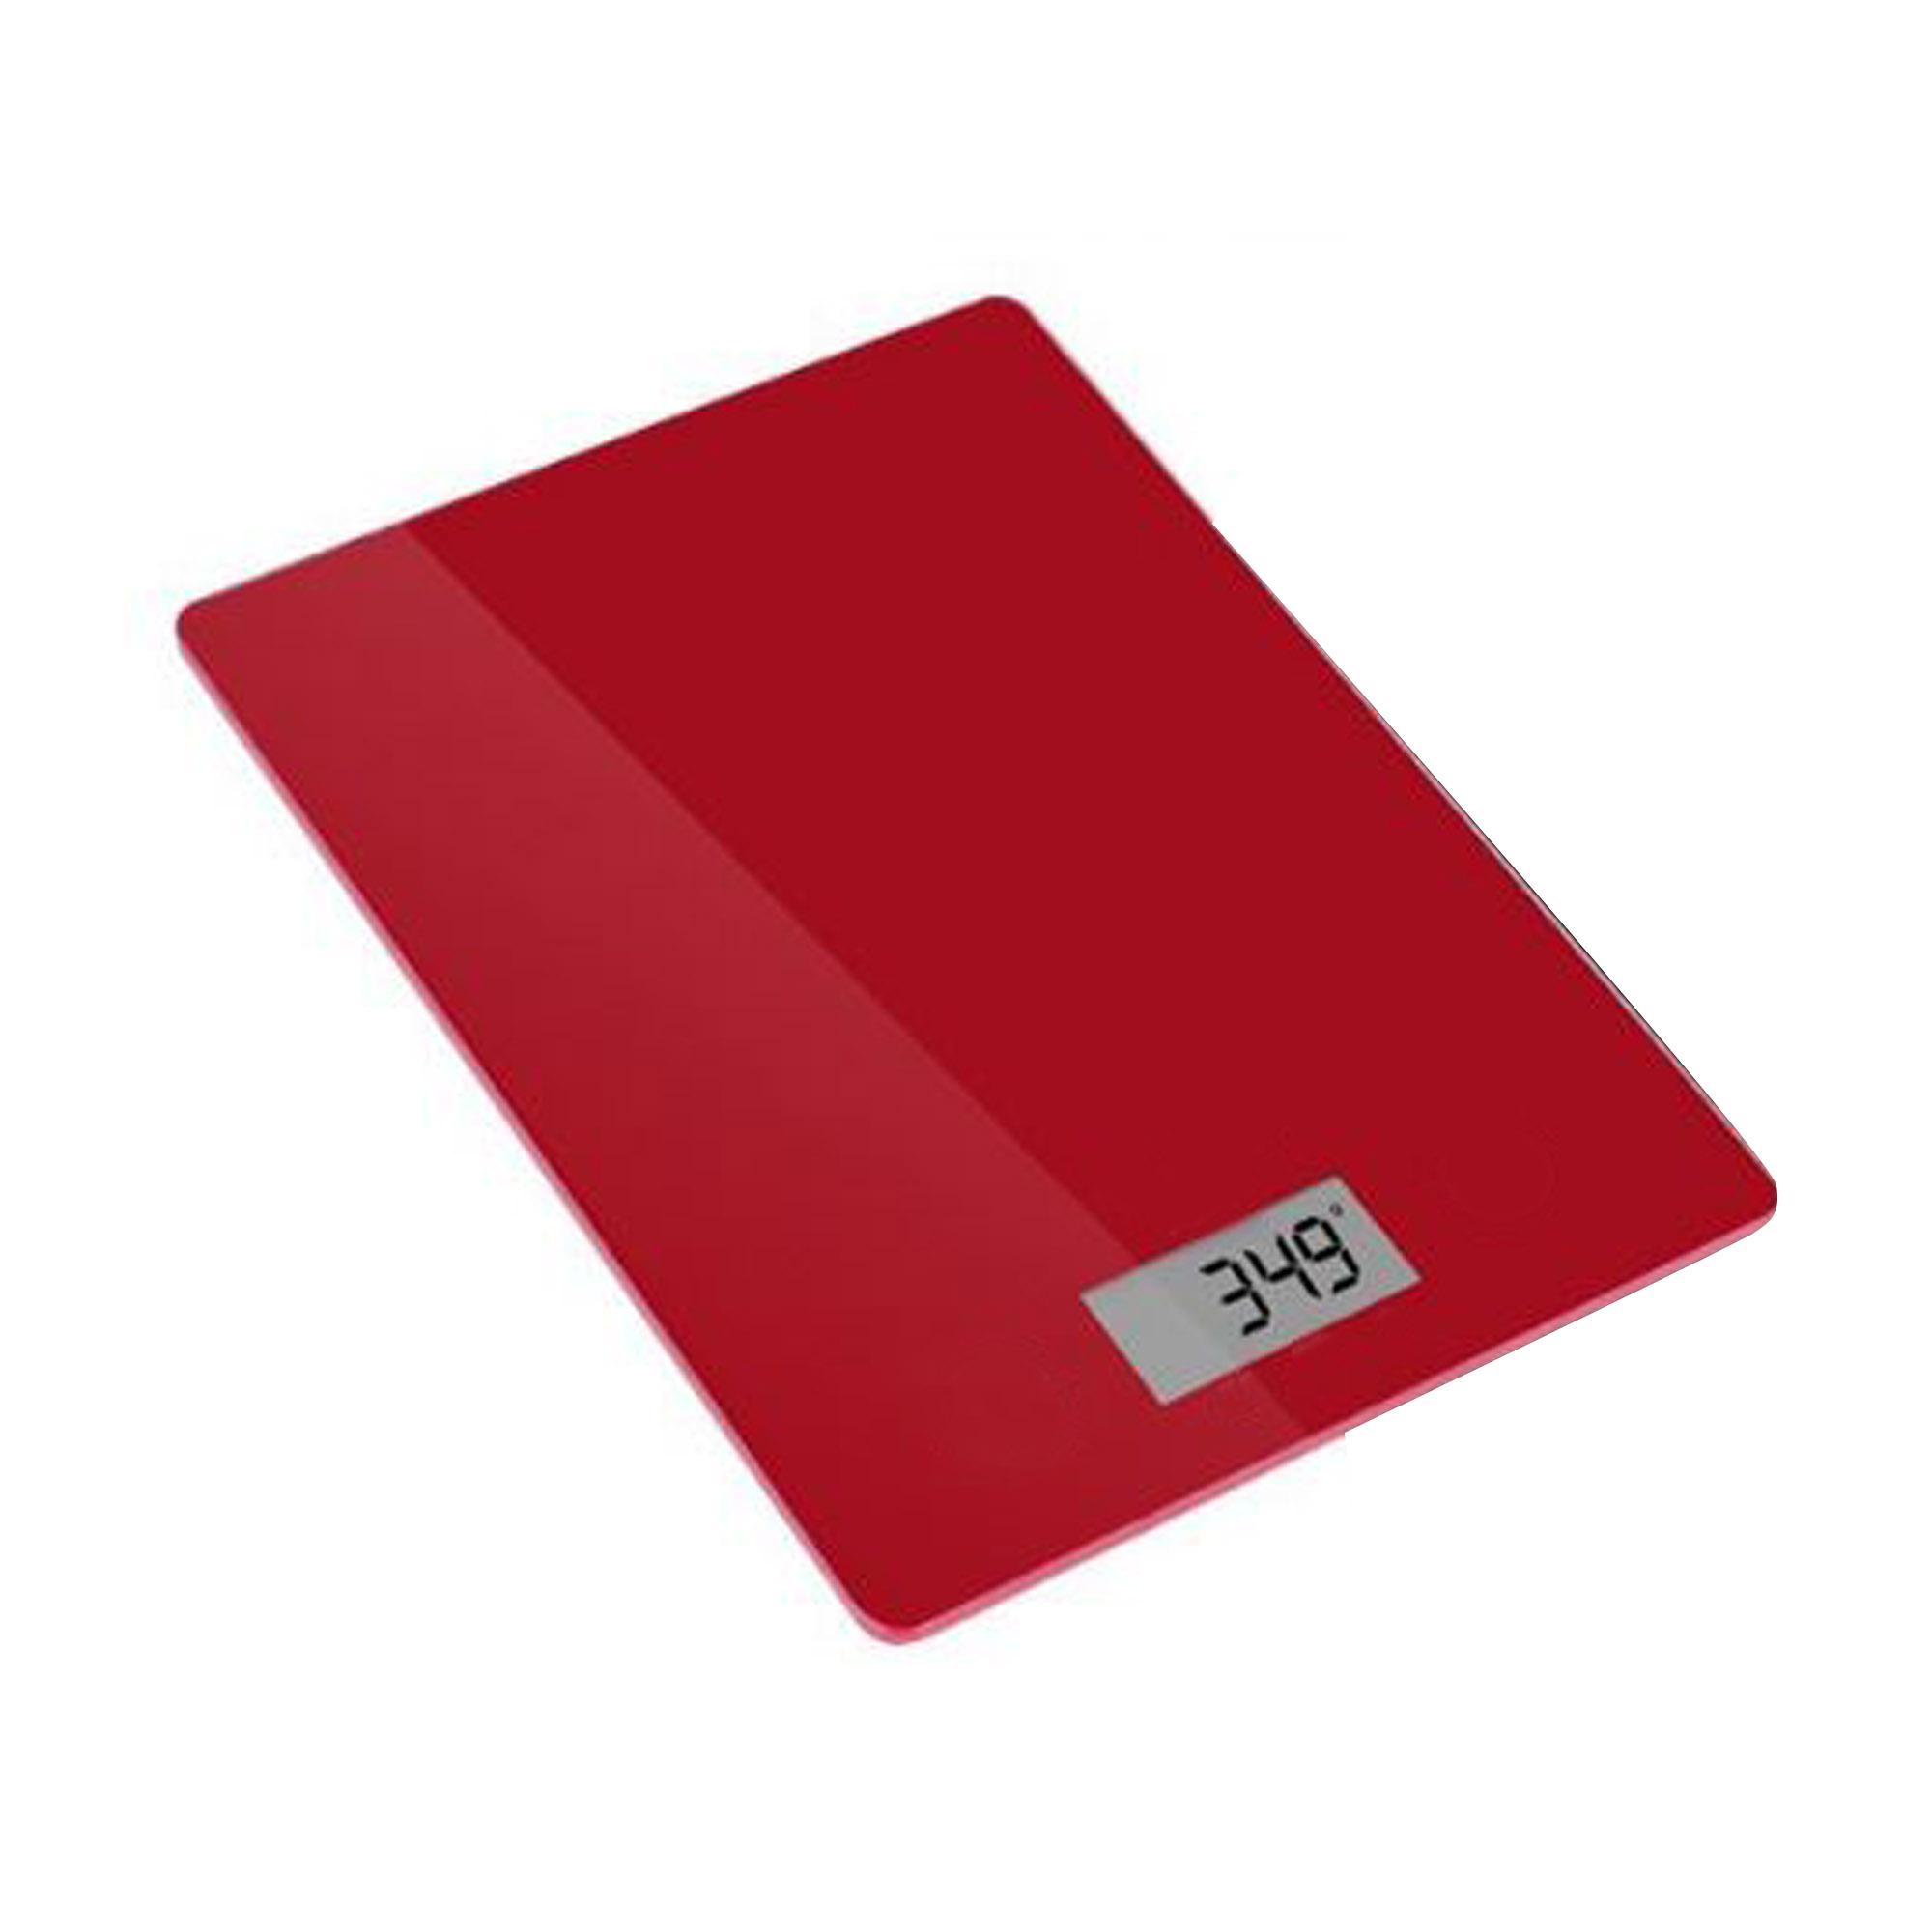 iag-smart-electronic-kitchen-scale-2